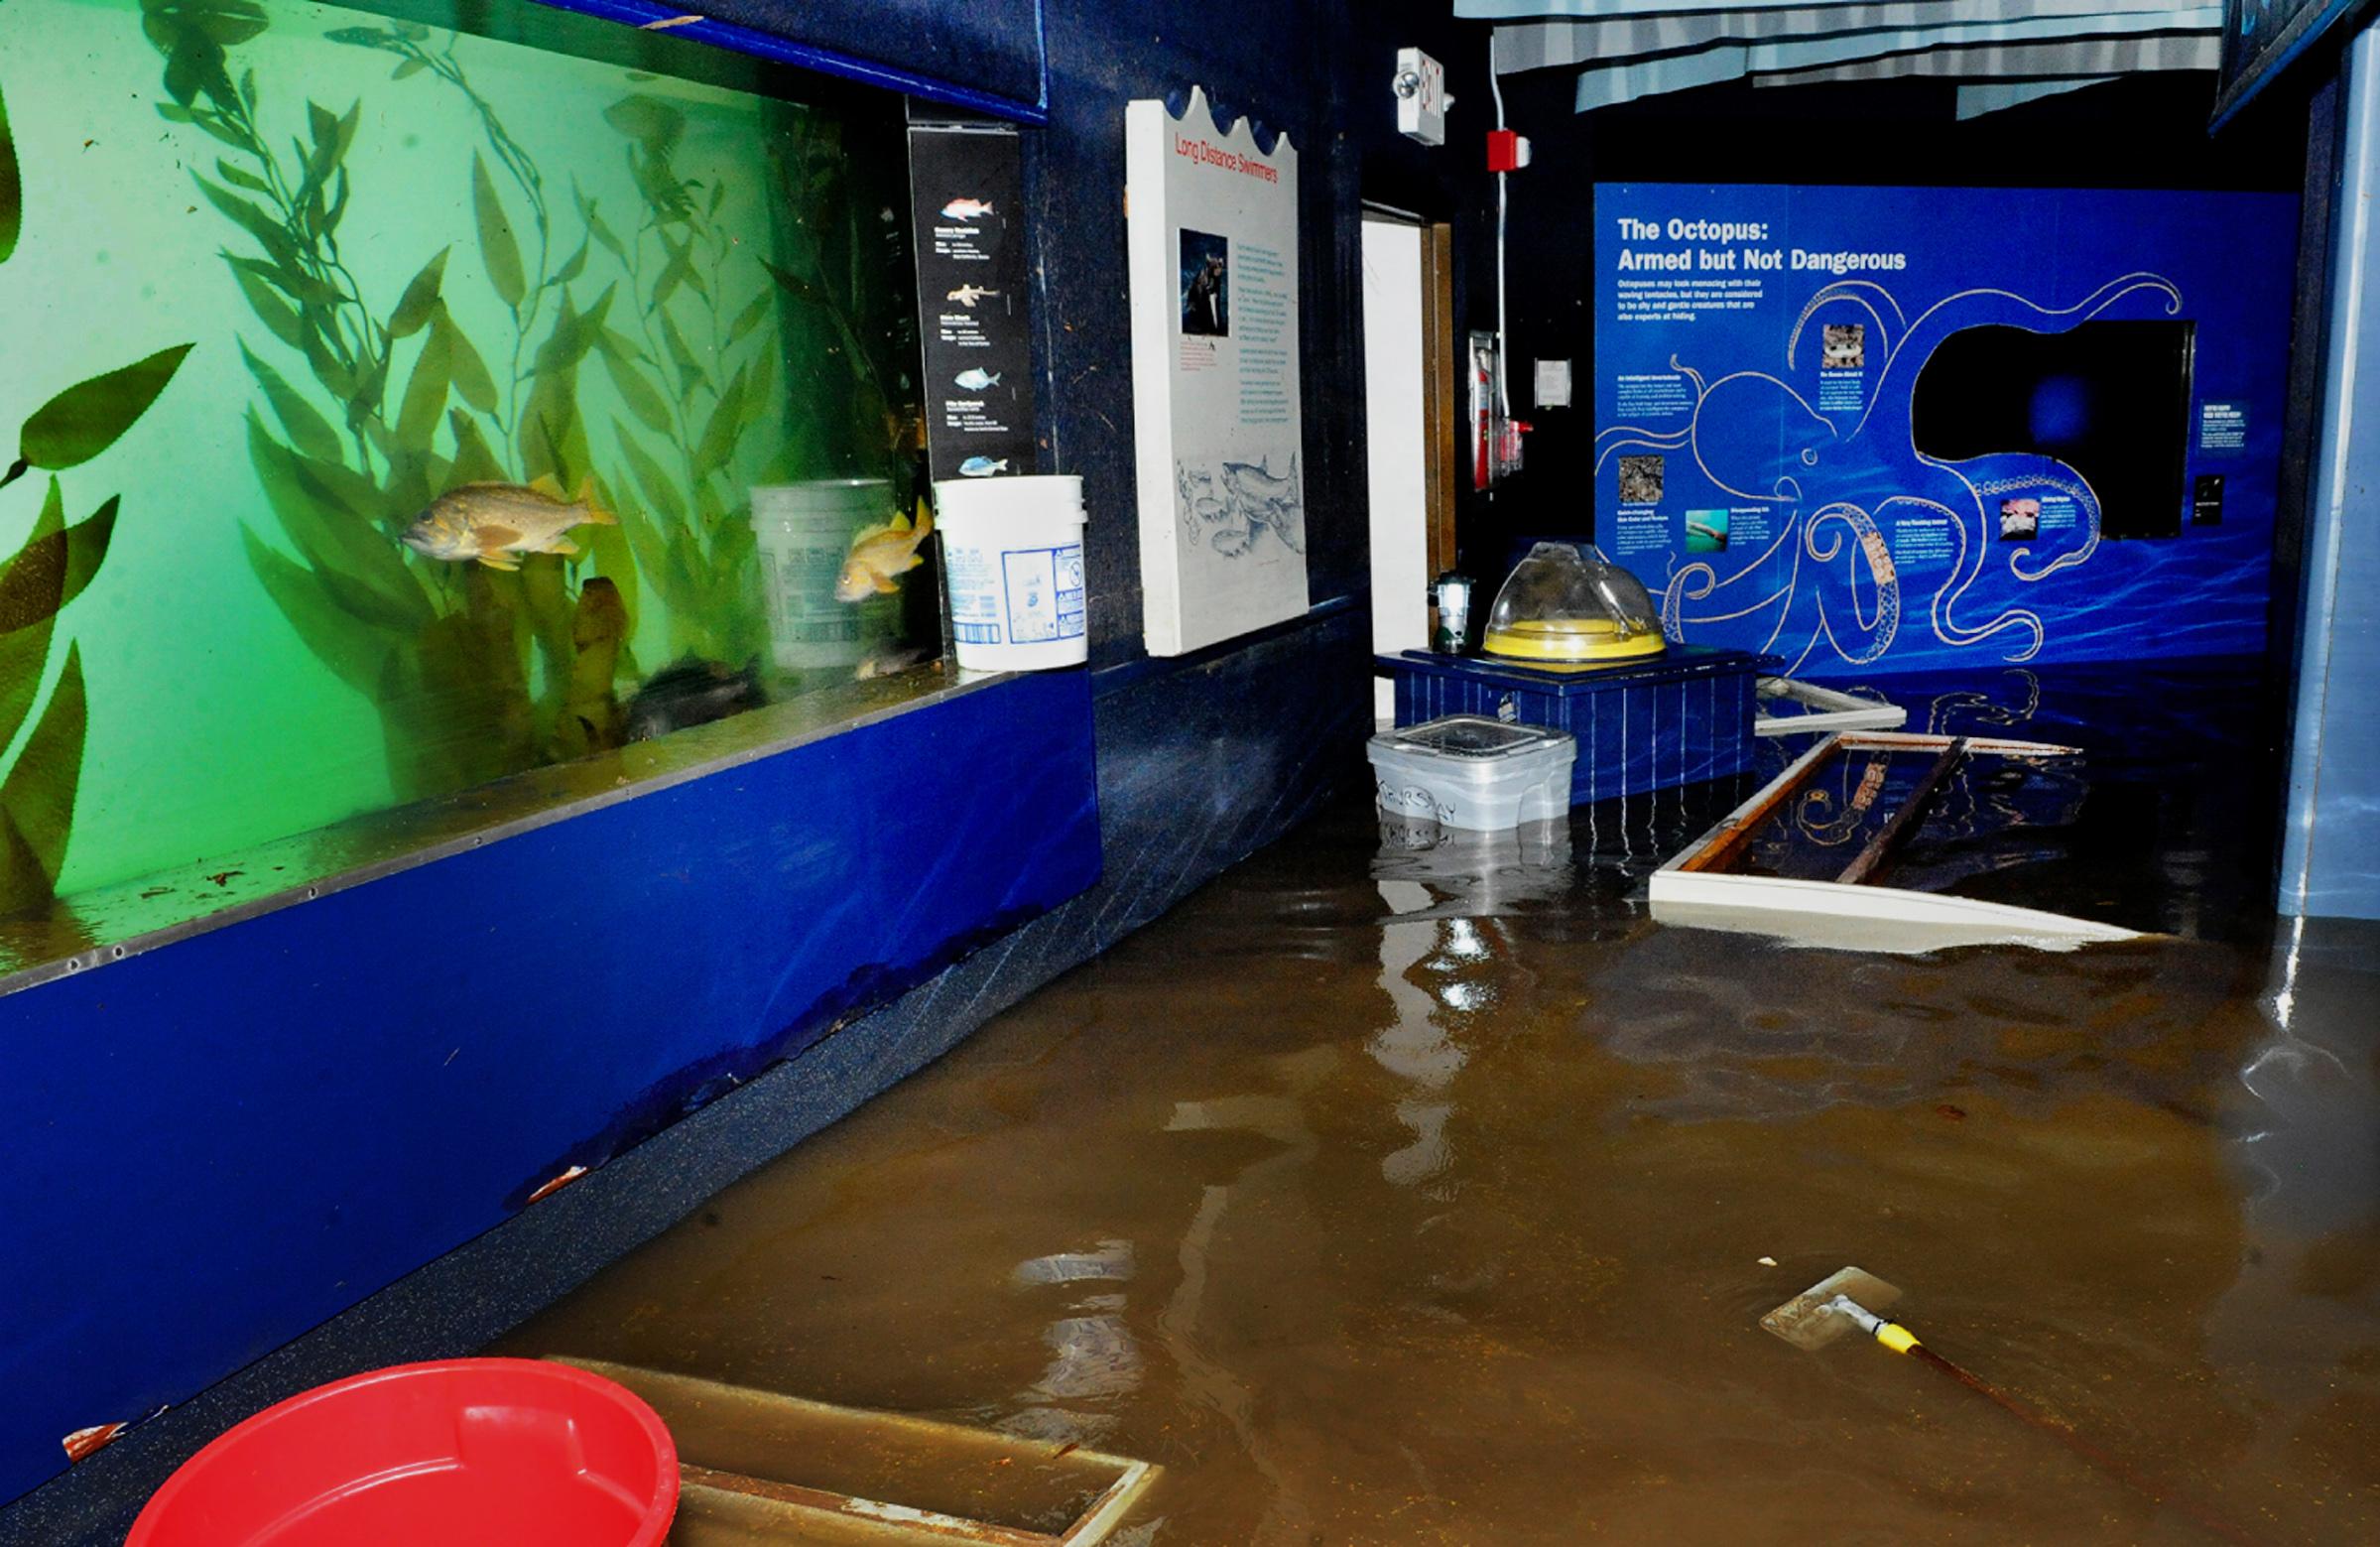 Brooklyn Ny Aquarium Loses Part Of Fish Collection To